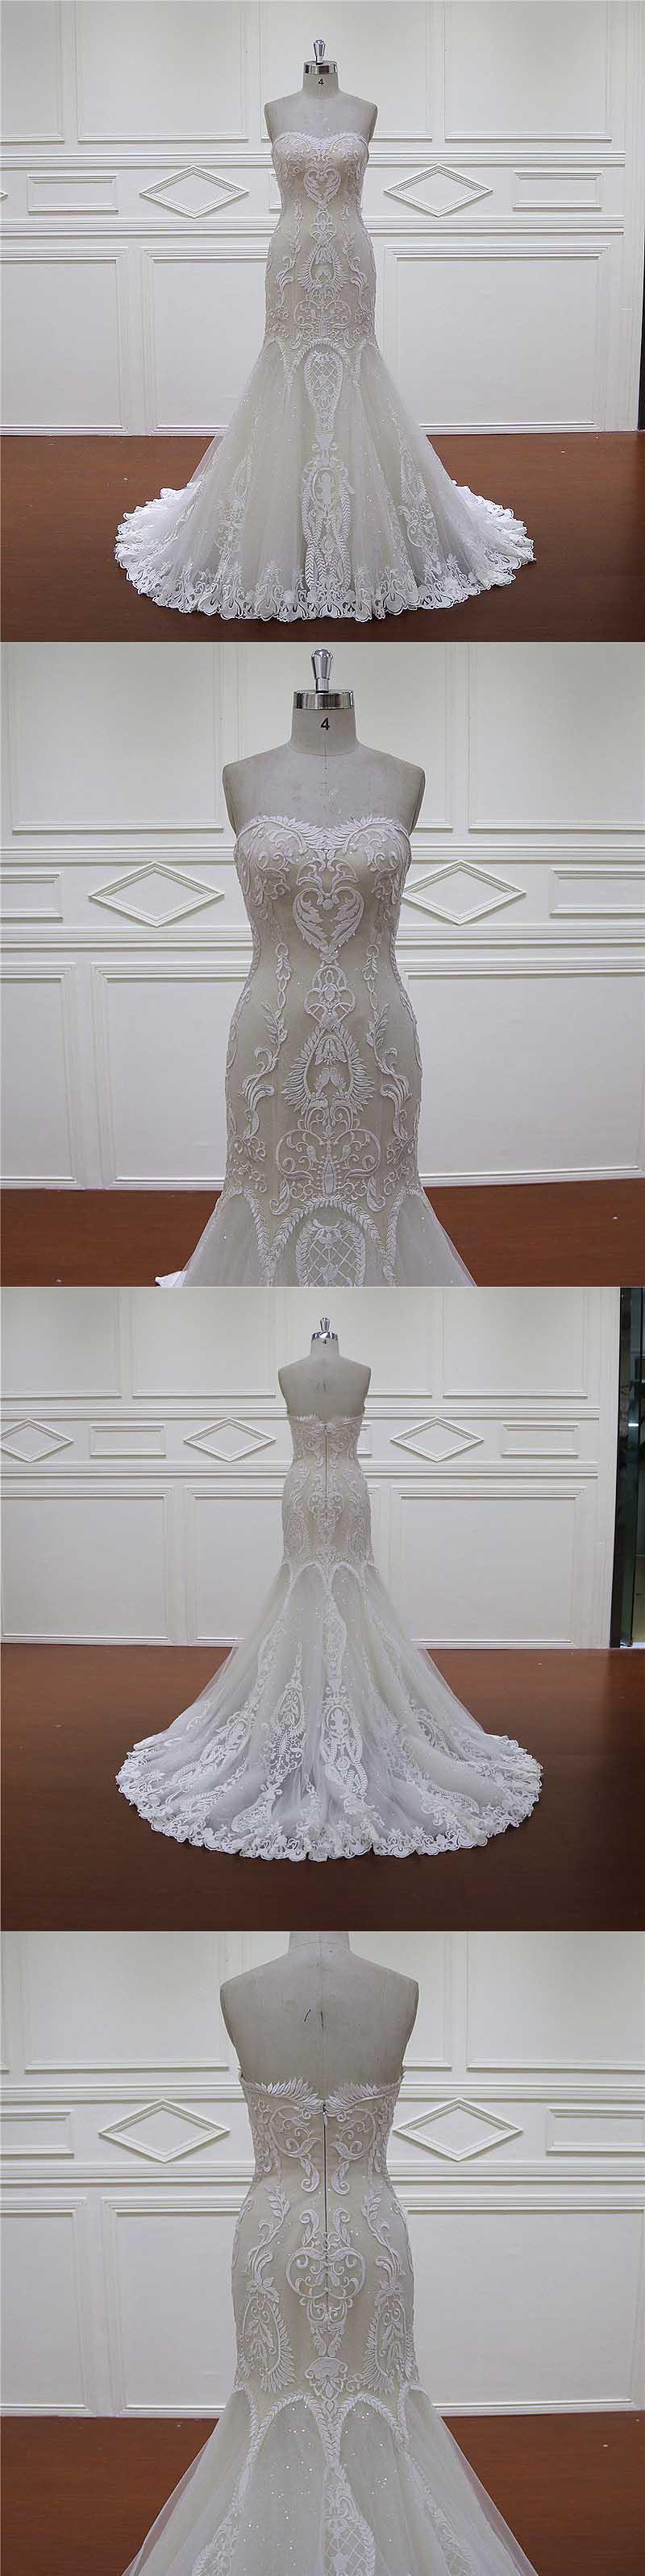 off Shoulder Sweetheart Crystal Beading Champagne Mermaid Bridal Dress